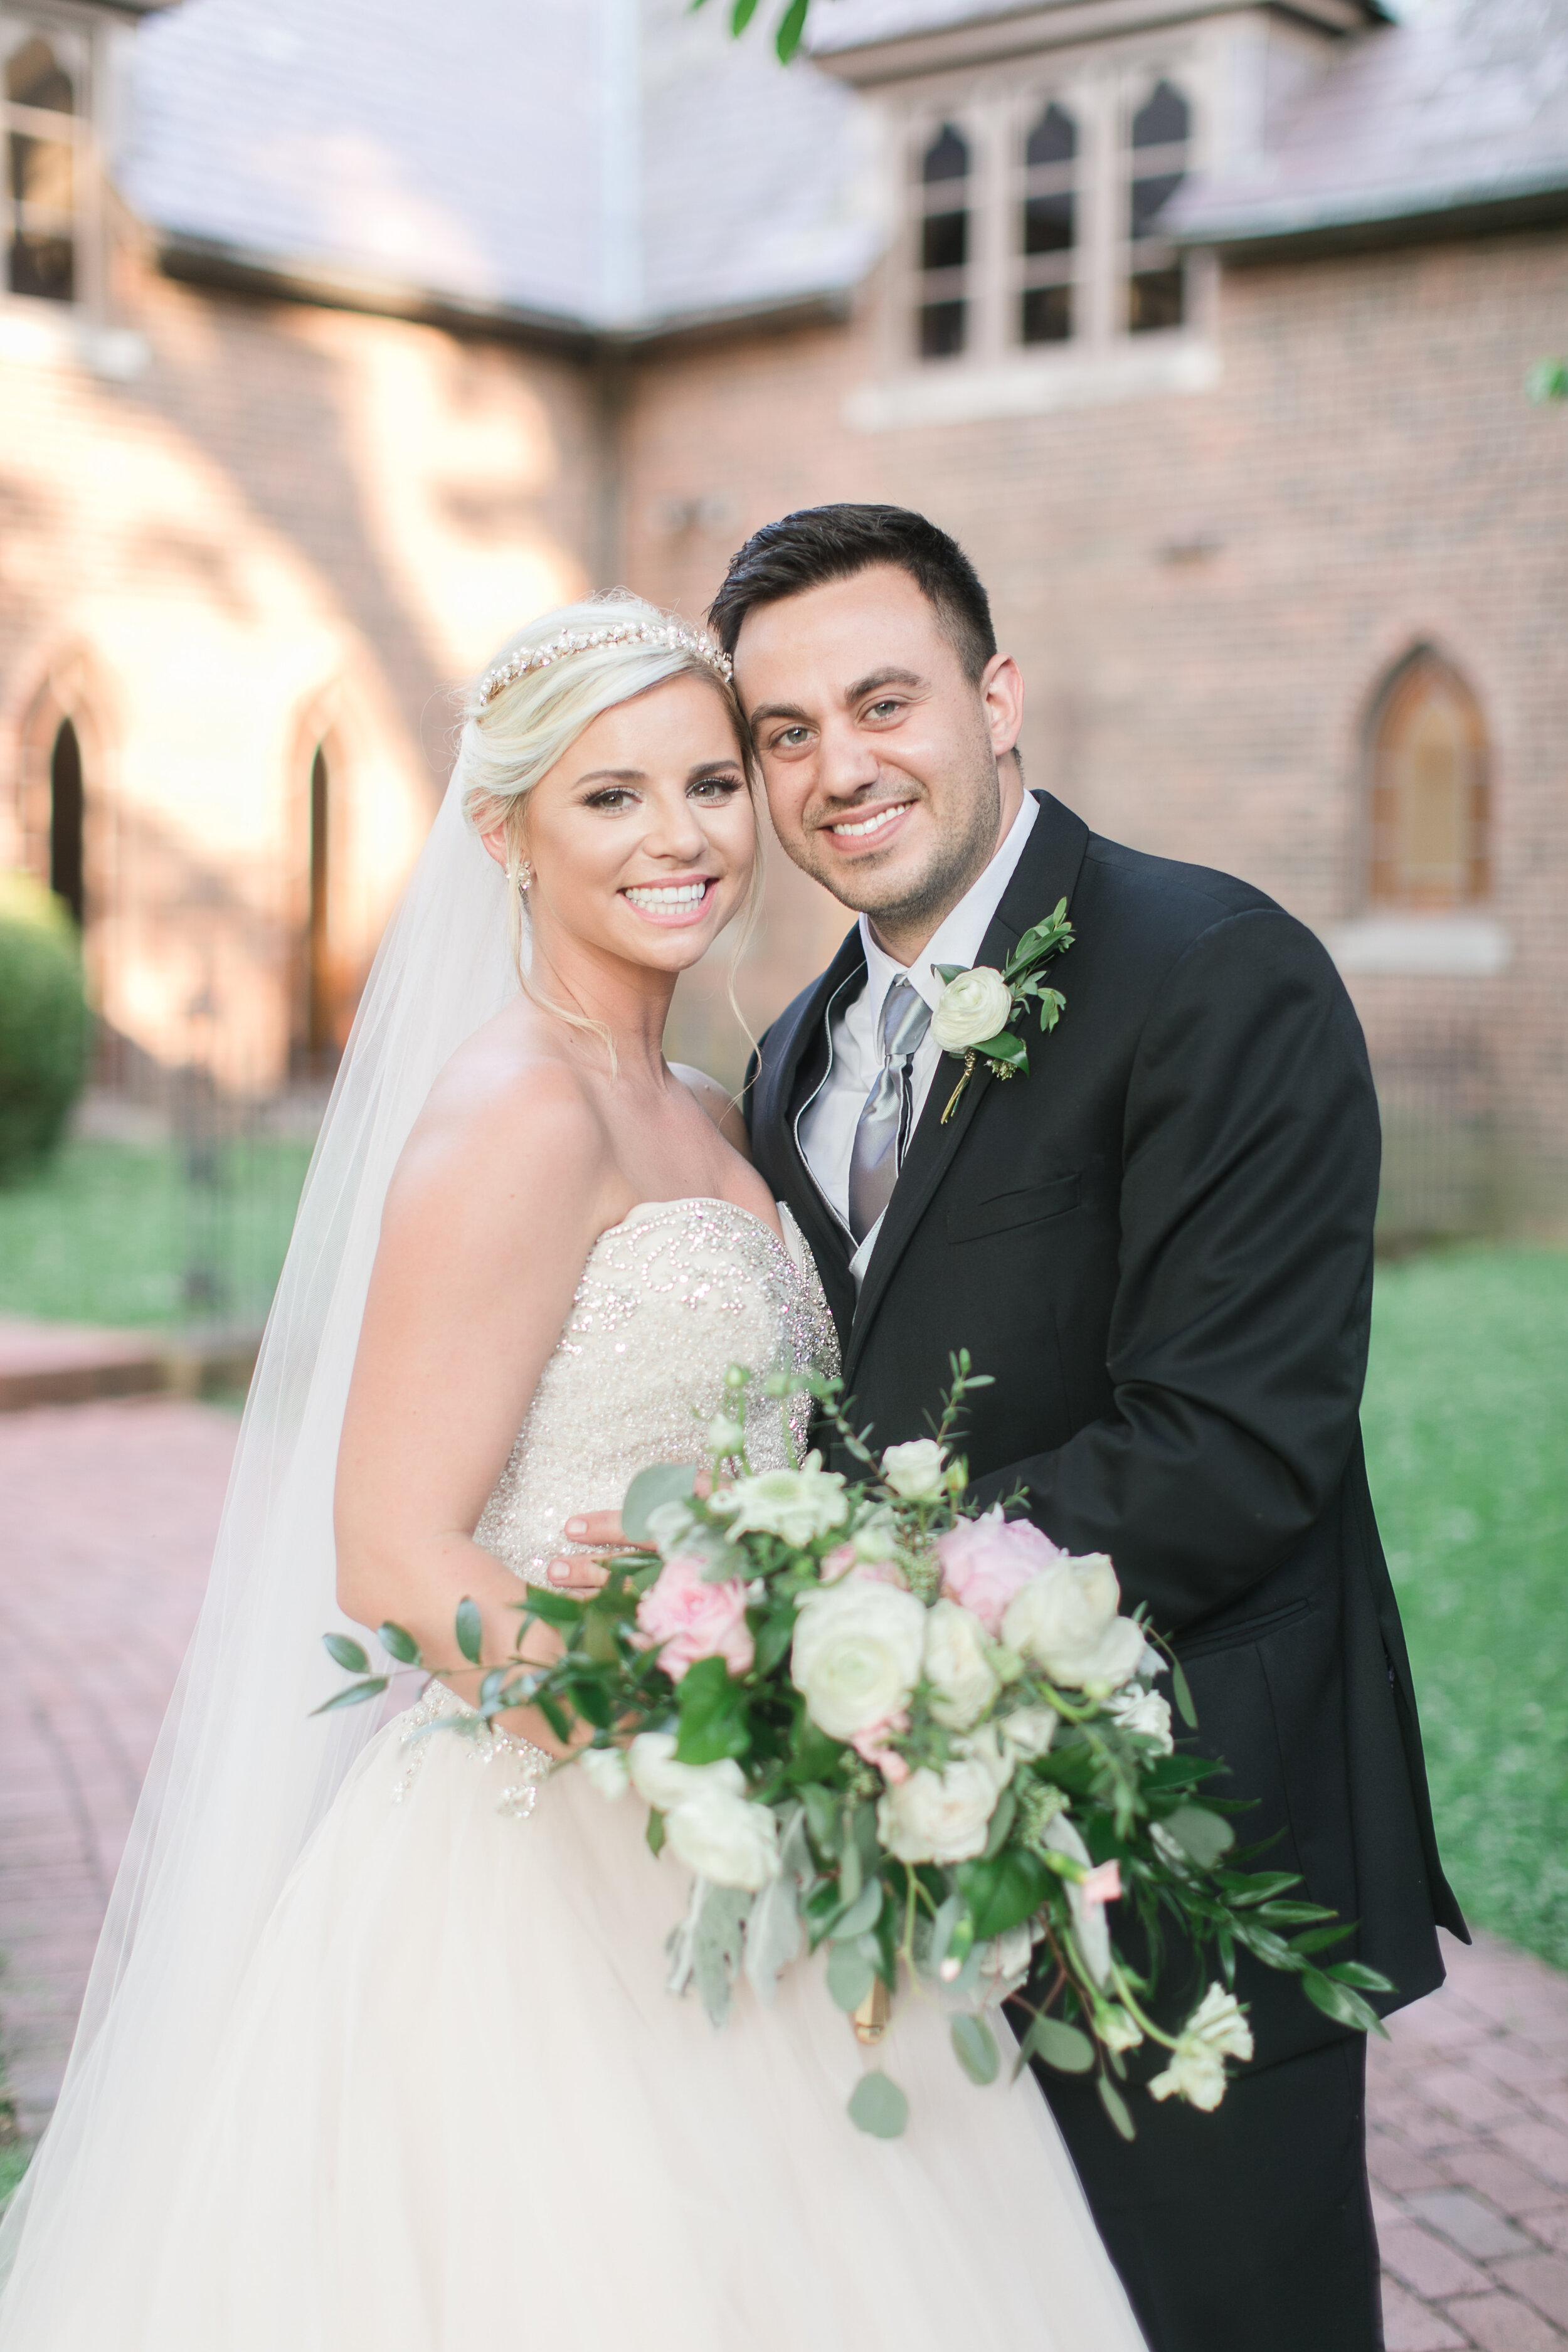 Holly-David-wedding-476.jpg